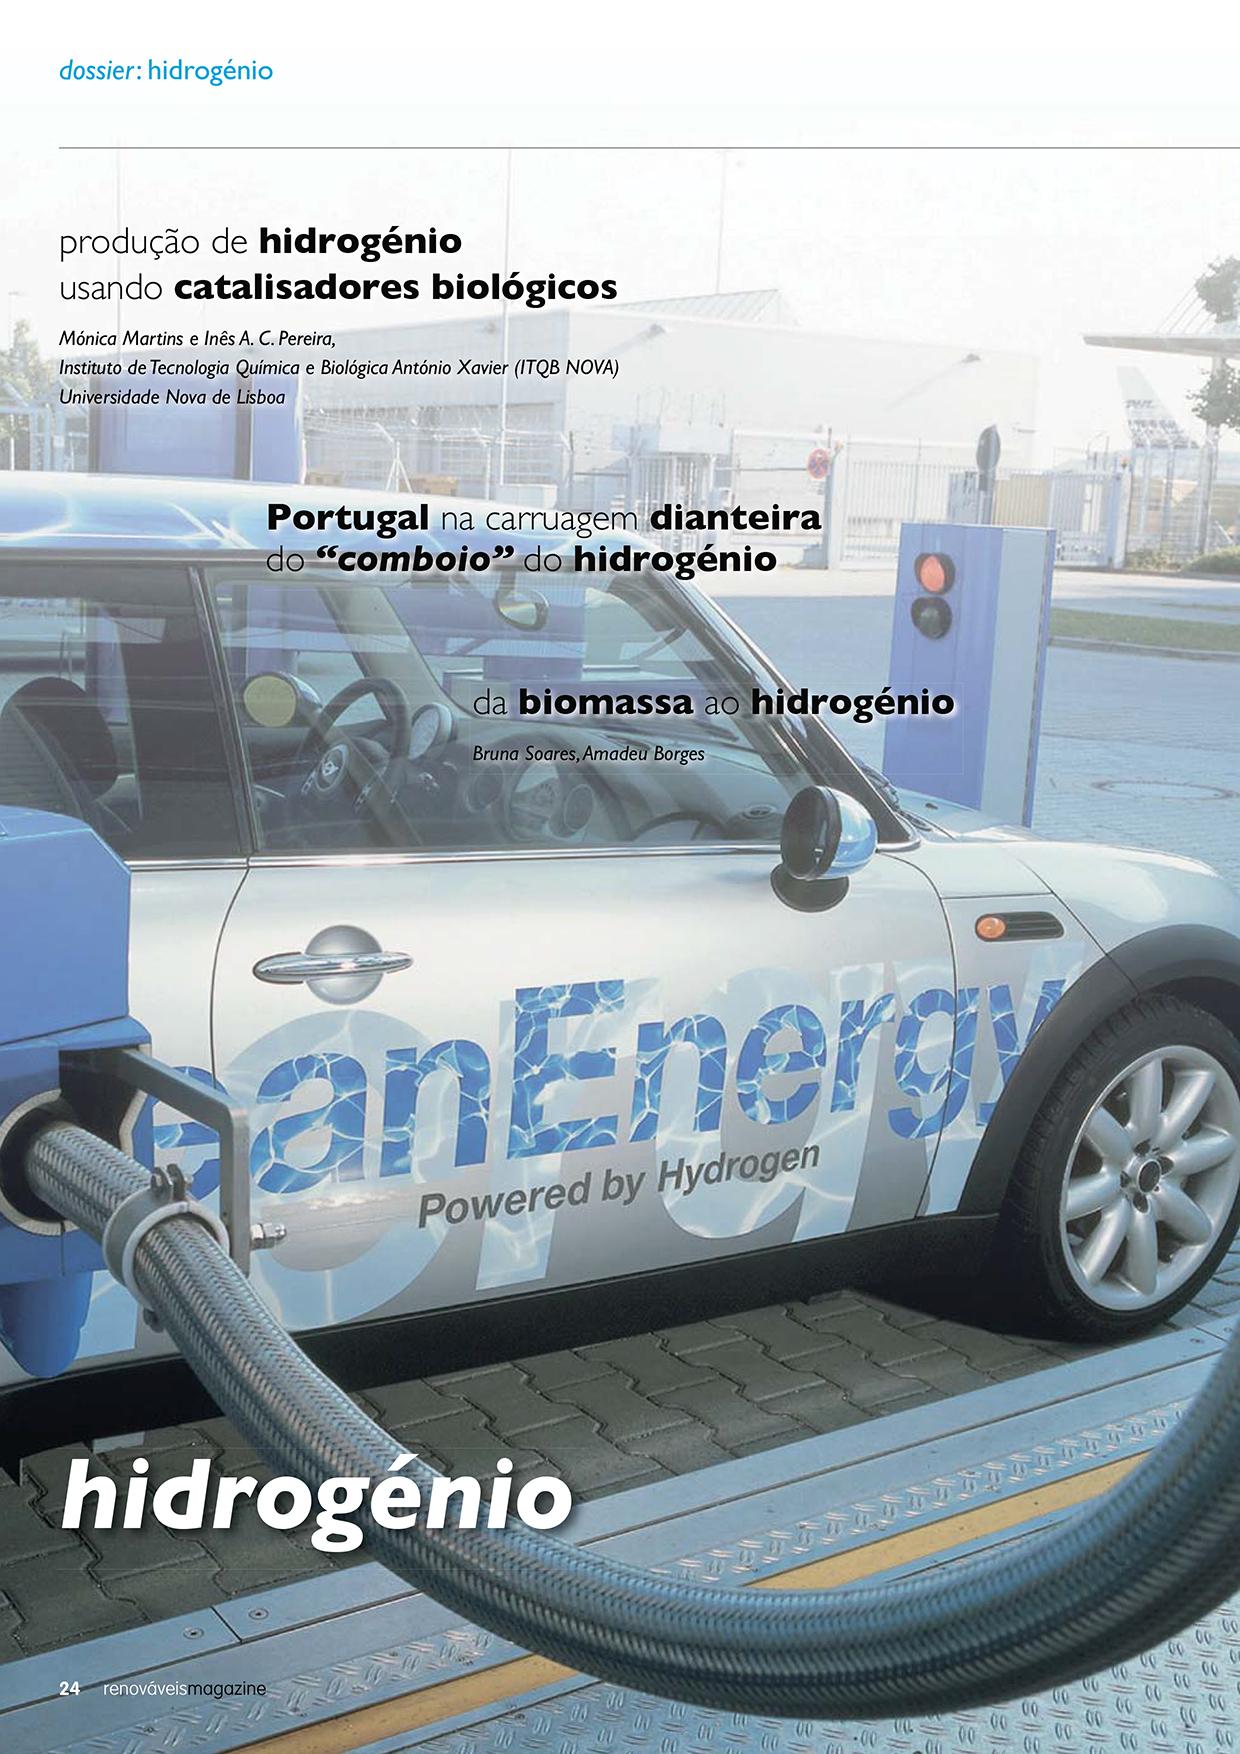 Dossier sobre Hidrogénio